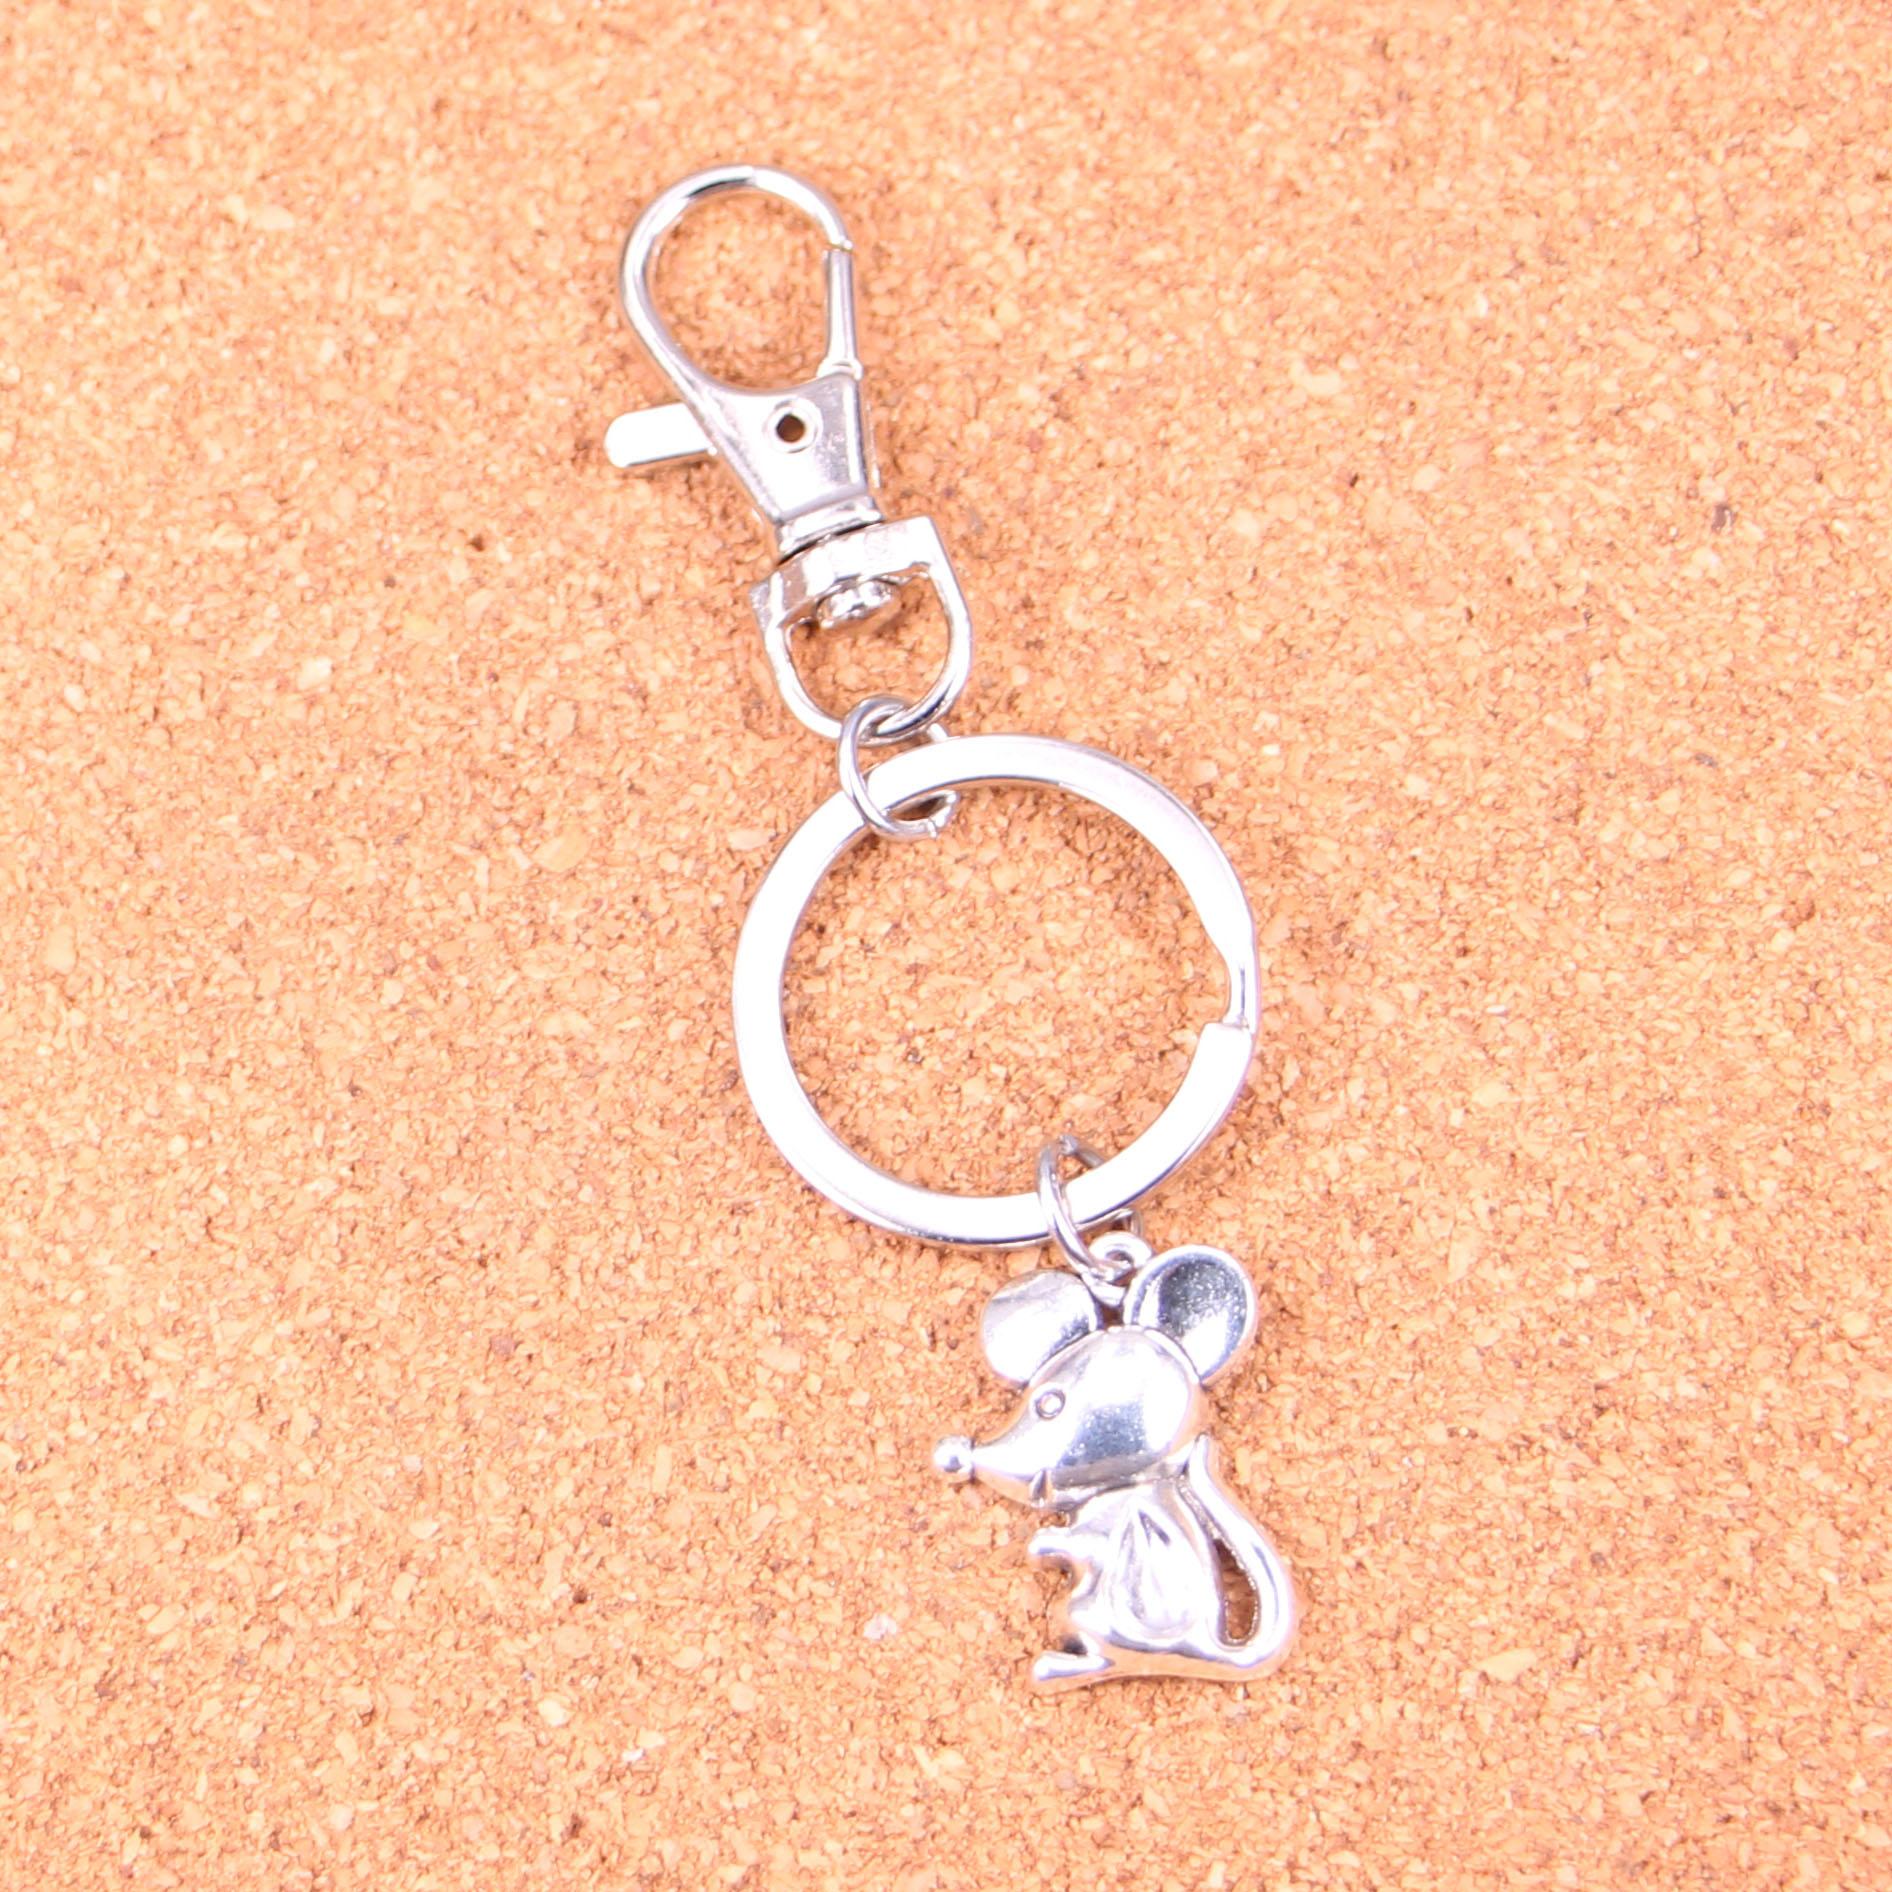 Cute Basset Hound Dog Diamante Handbag Keyring Rhinestone Charm Bling NEW